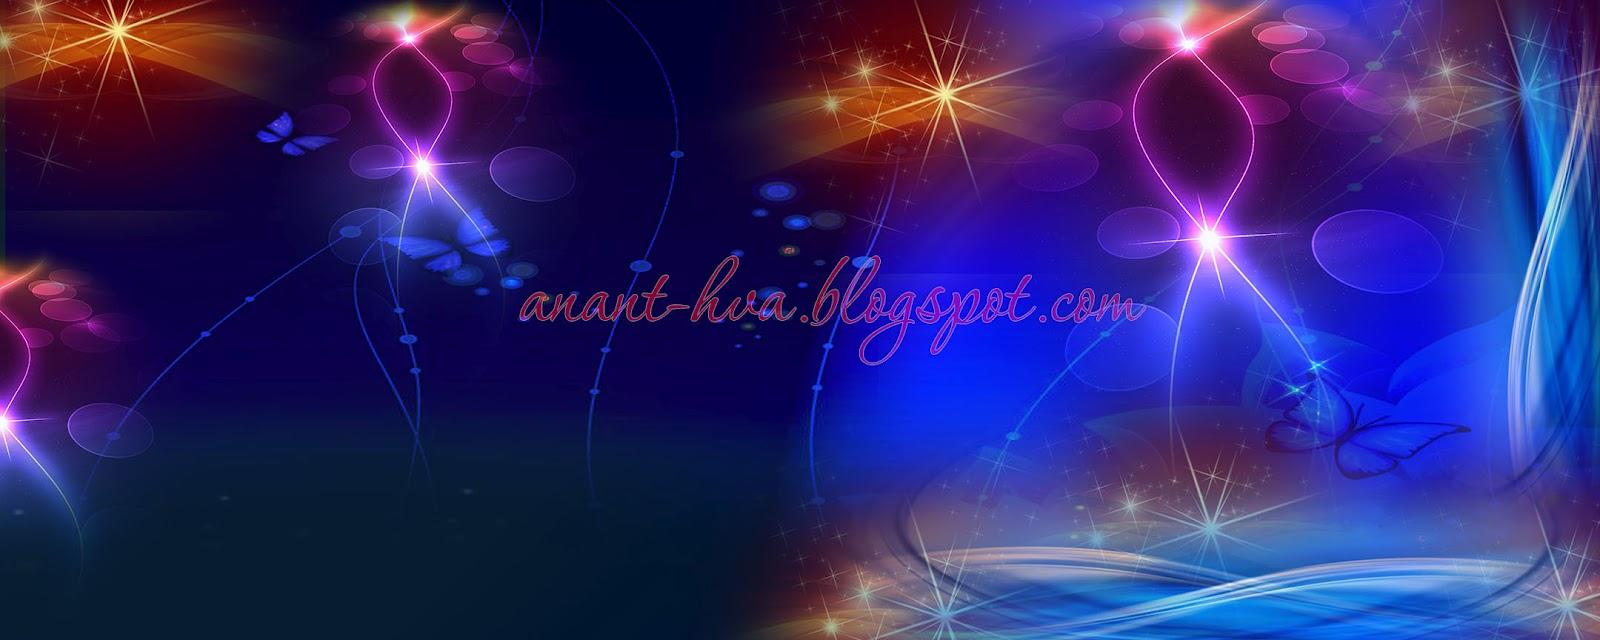 designe, karizma album, karizma album background, Photo album ...